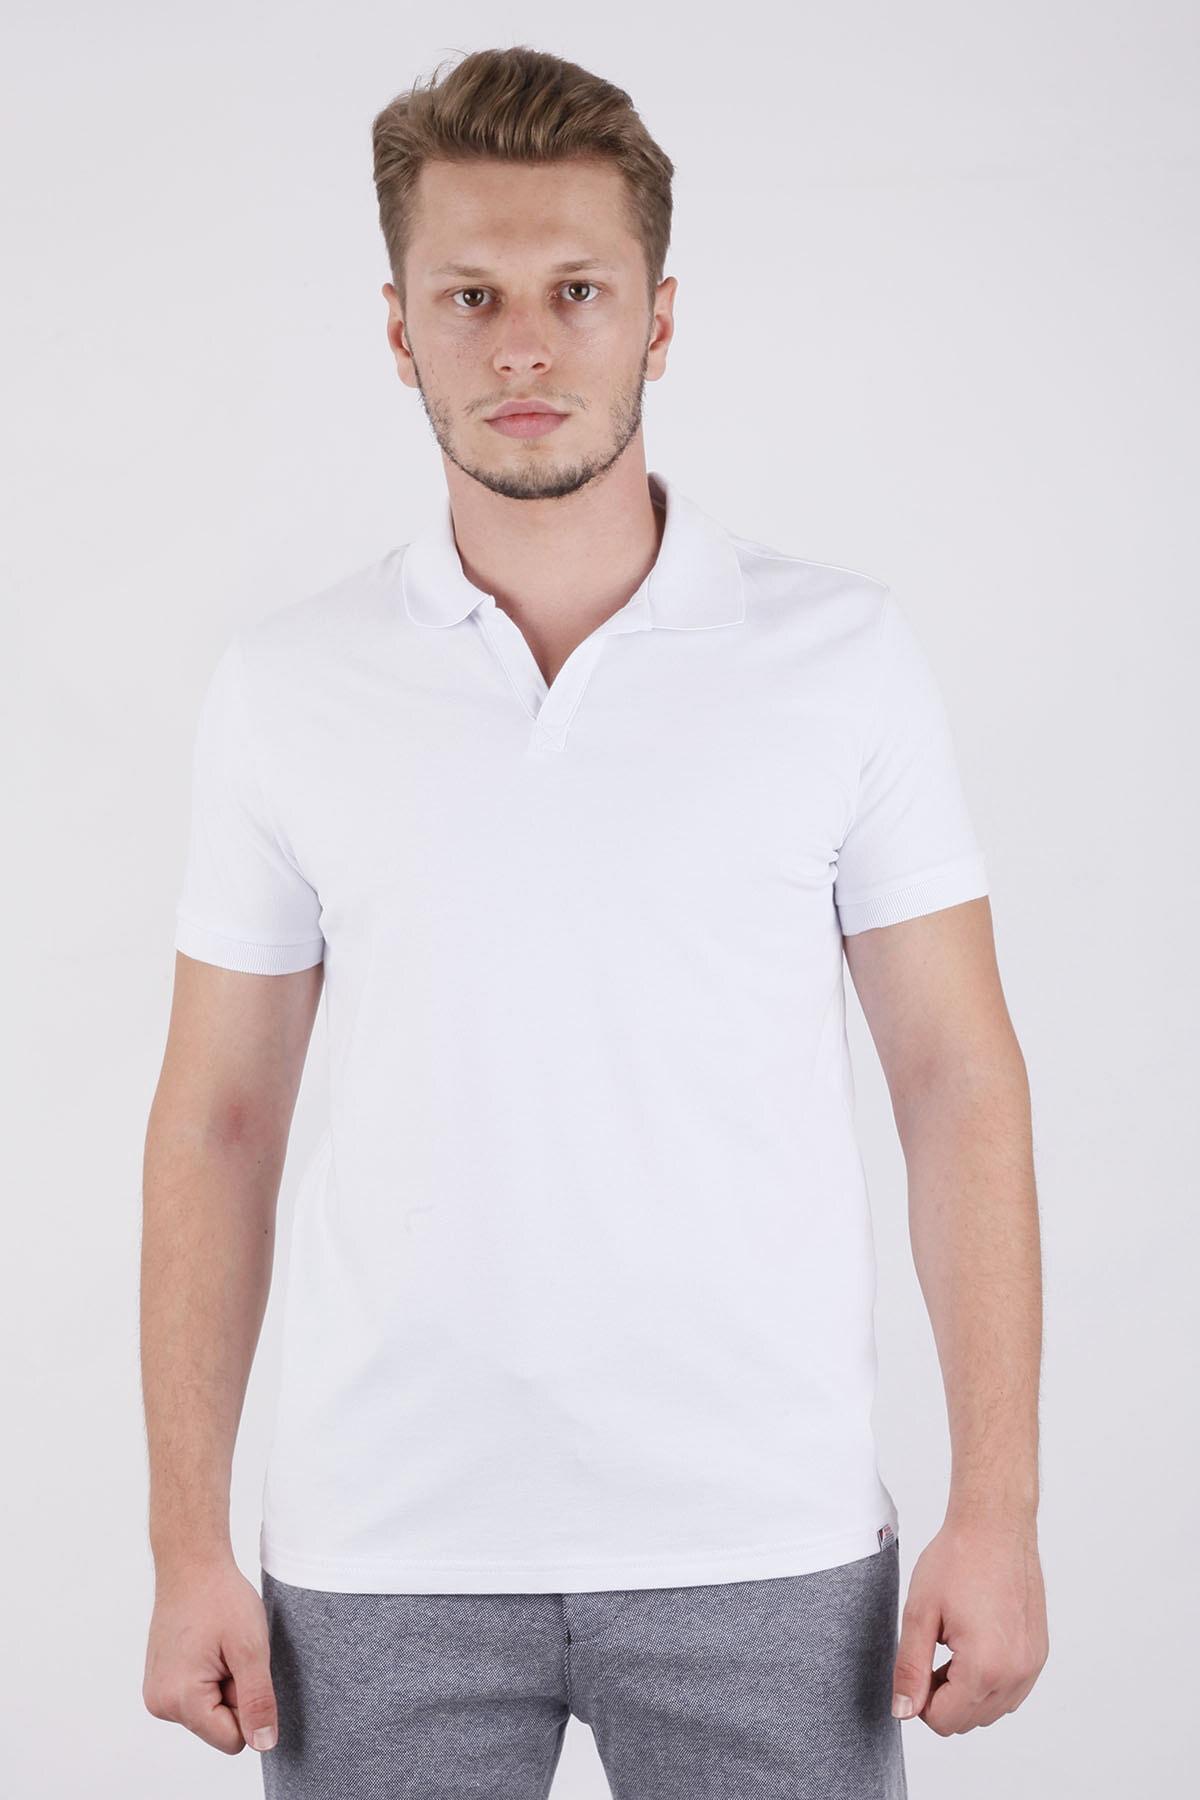 Canelia Erkek Beyaz Renk Slimfit T-shirt 1